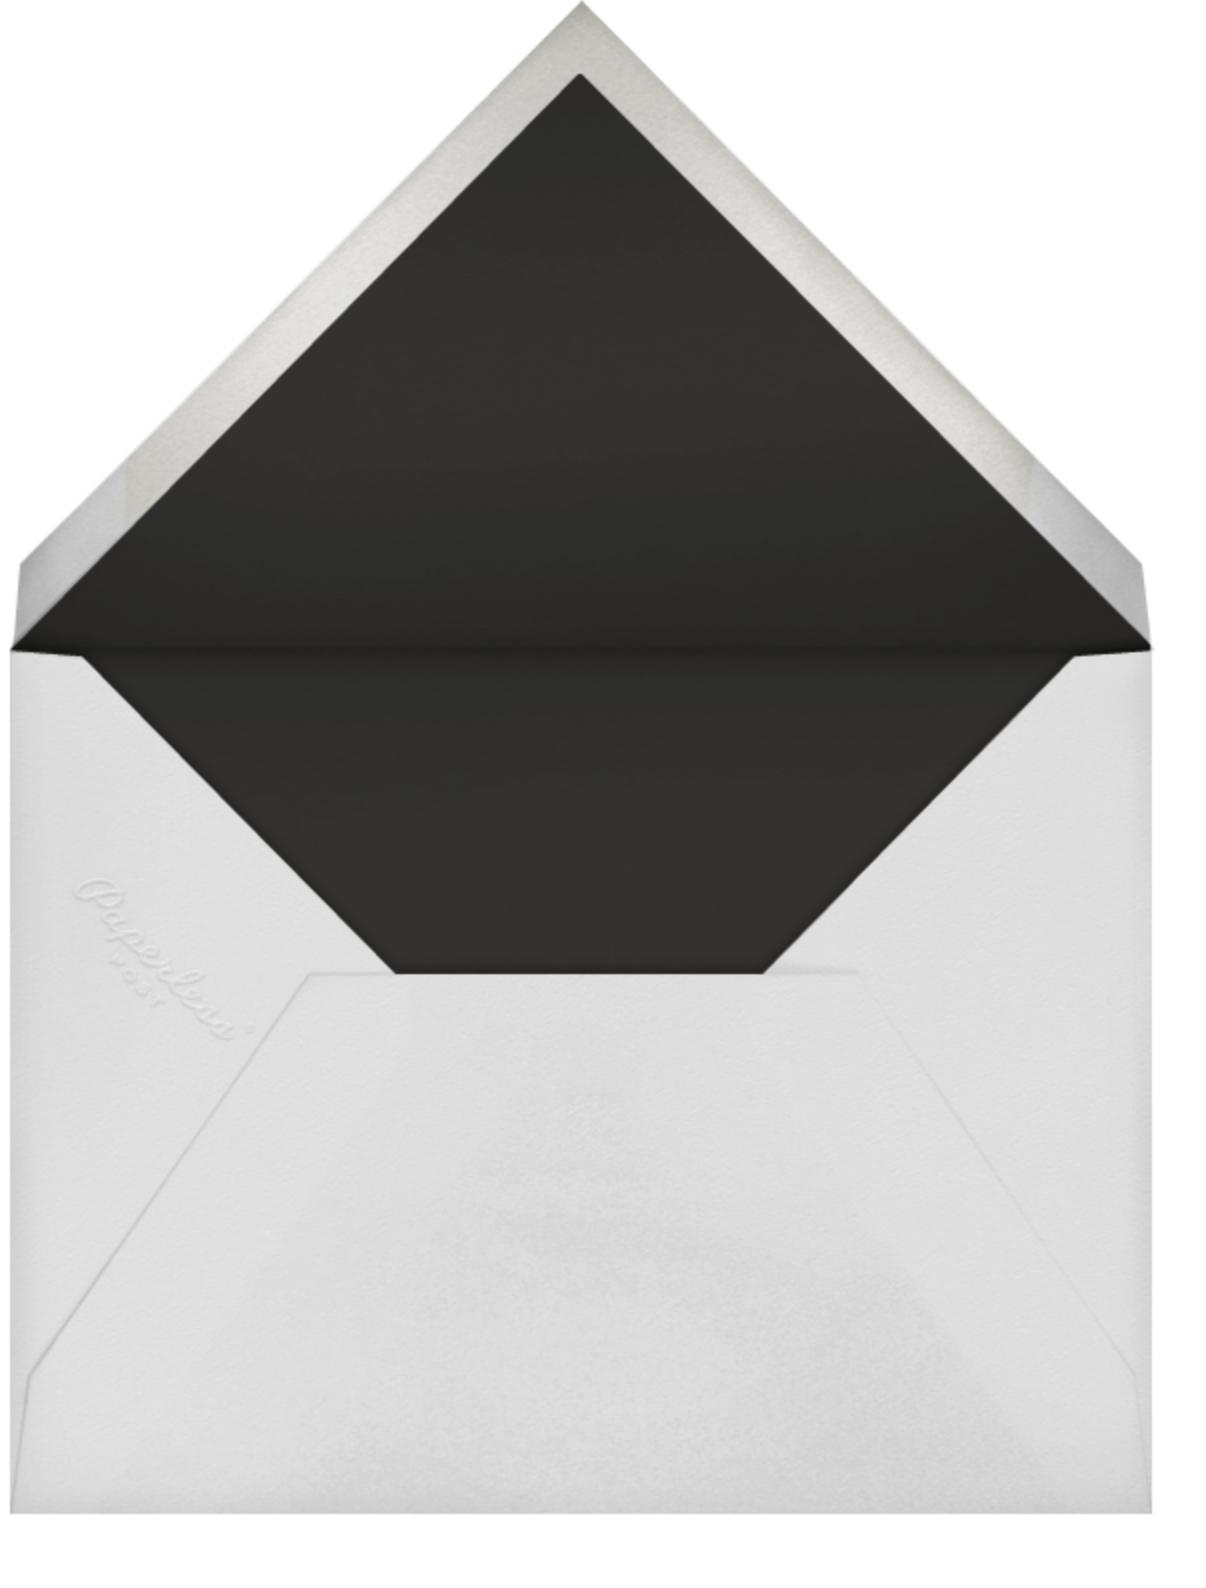 Richmond Park (Save the Date) - White/Rose Gold - Oscar de la Renta - Save the date - envelope back